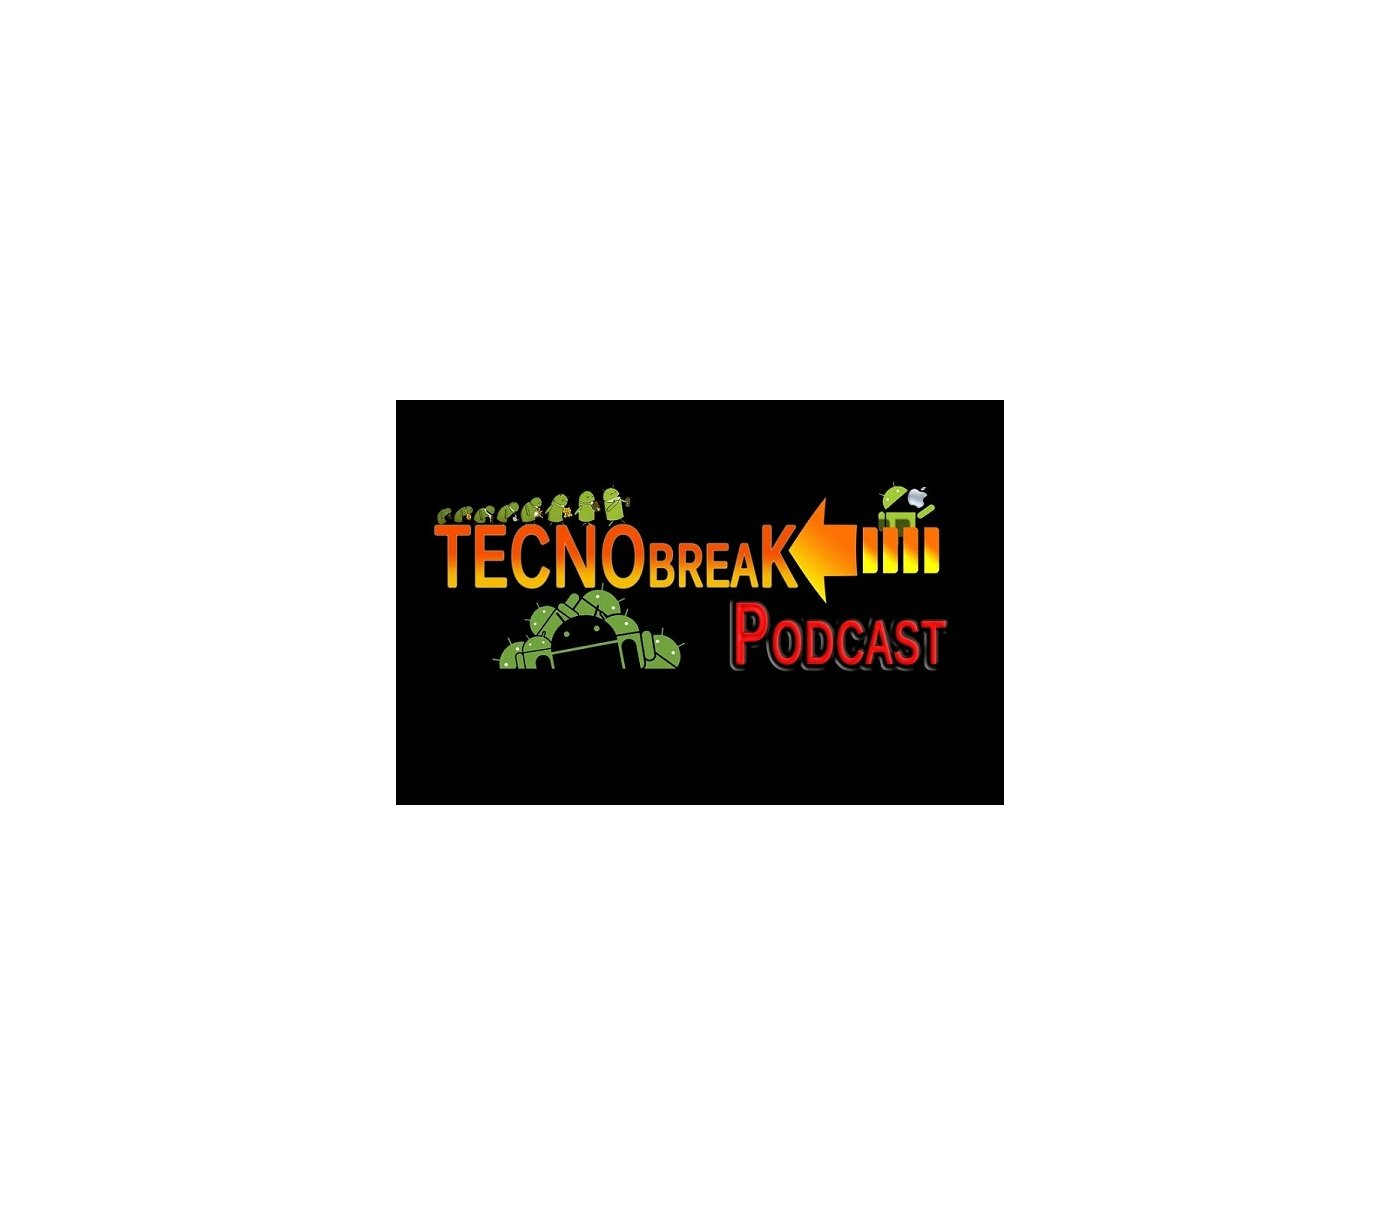 <![CDATA[Tecnobreak Podcast]]>